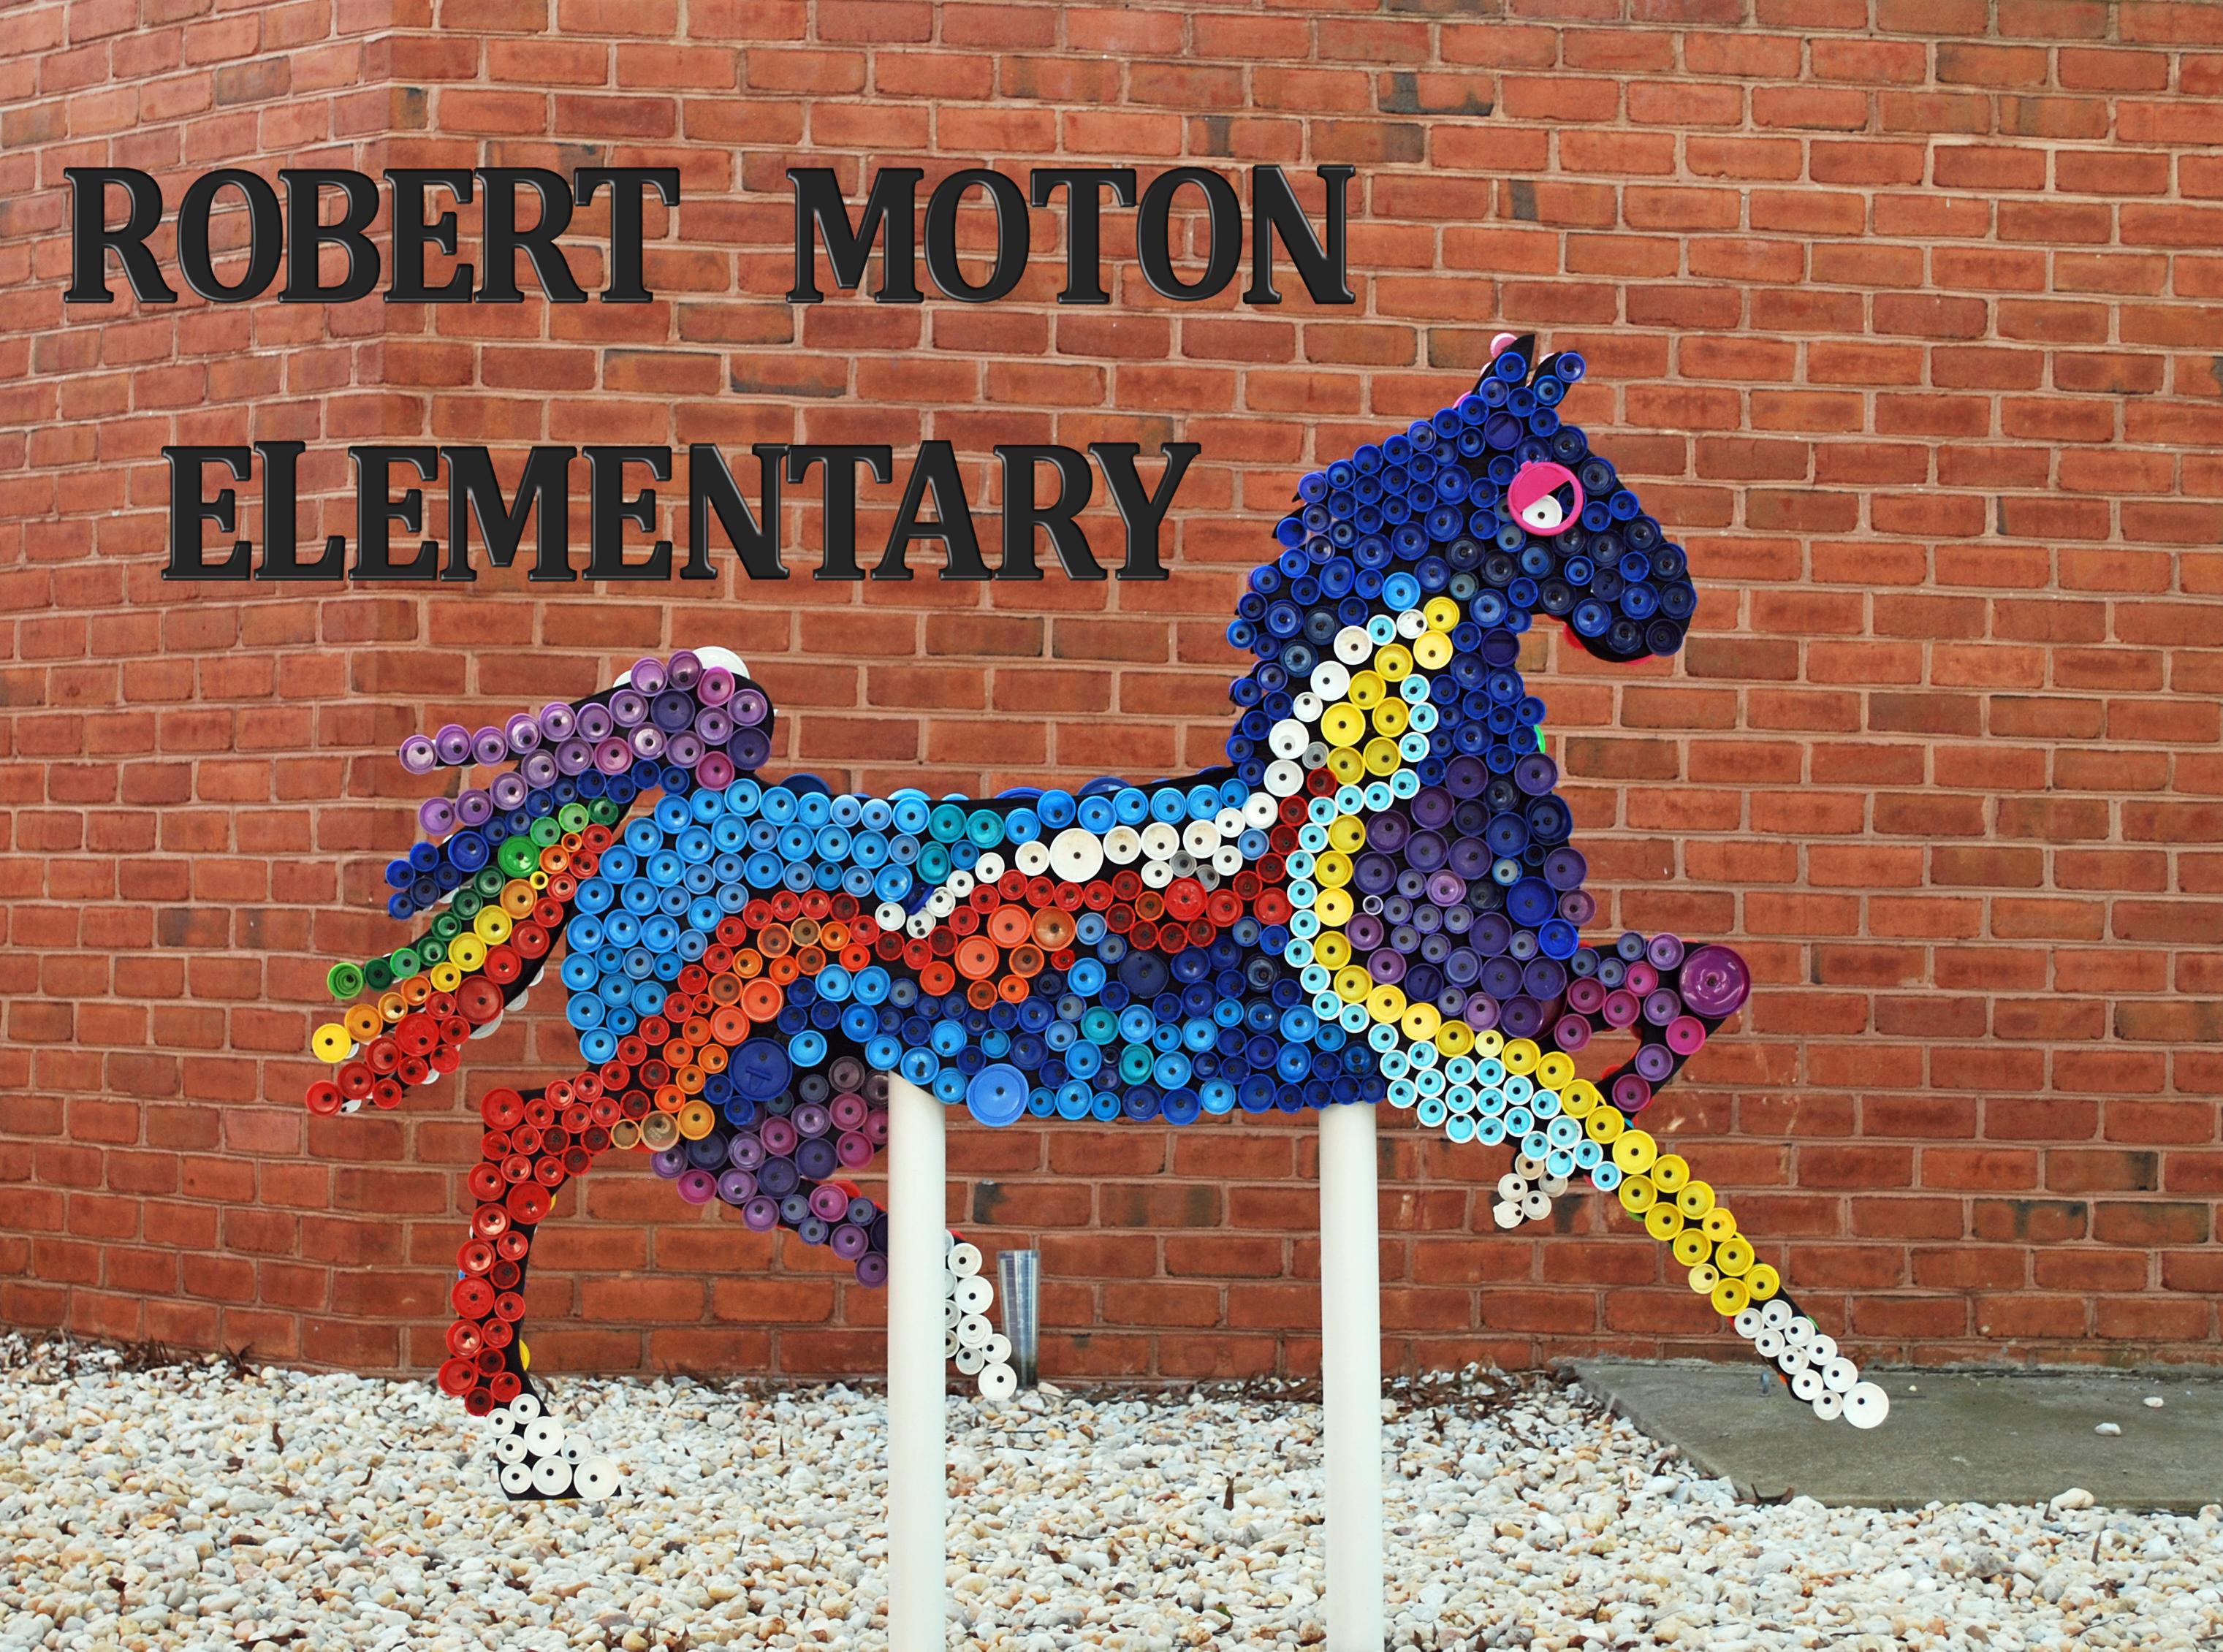 Robert Moton Elementary